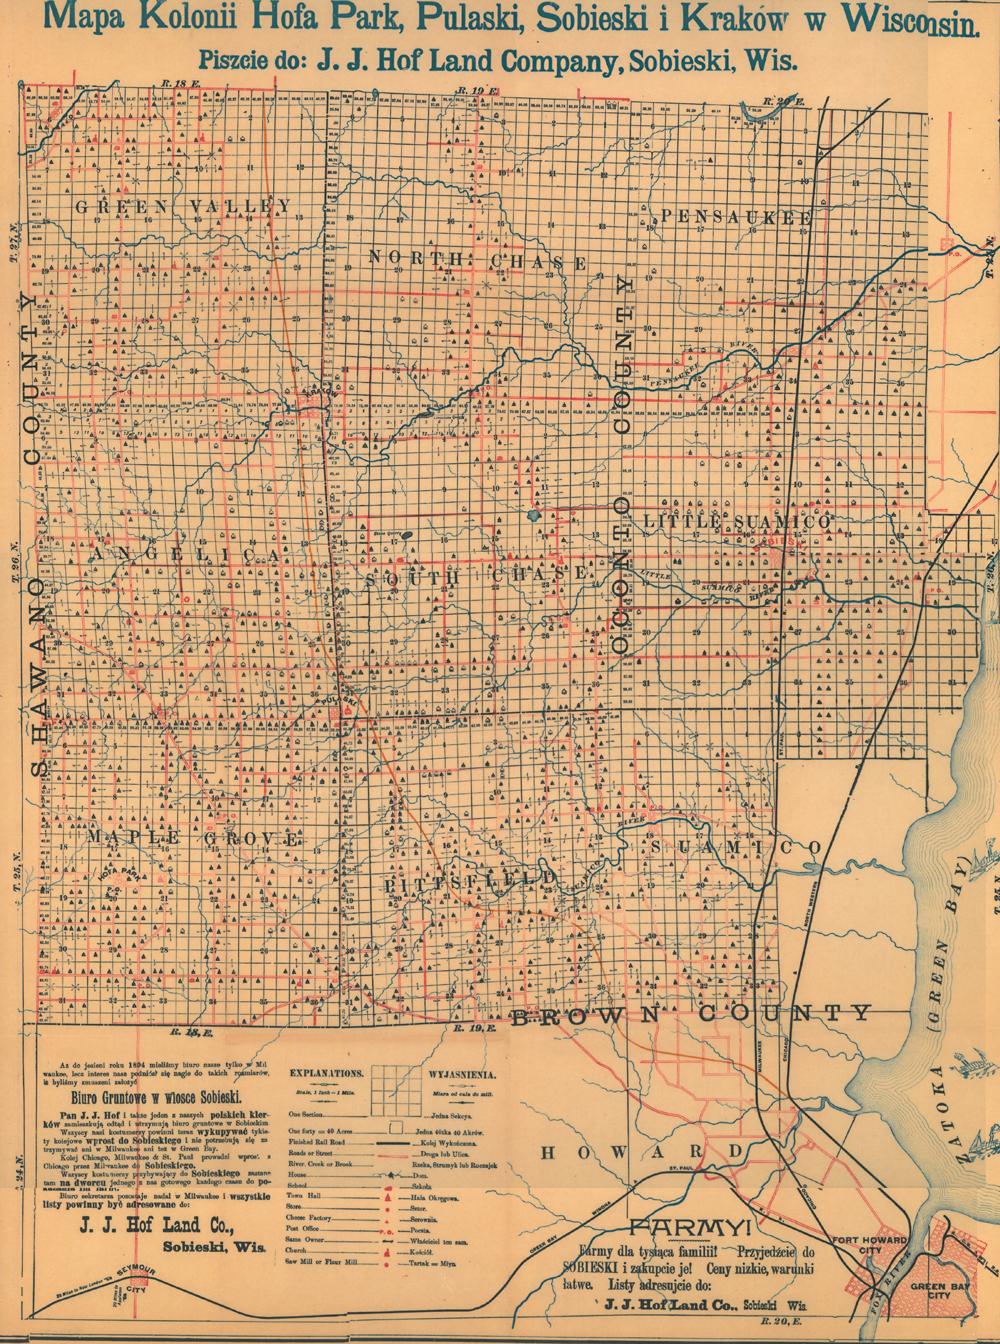 Old map of Pulaski Wisconsin